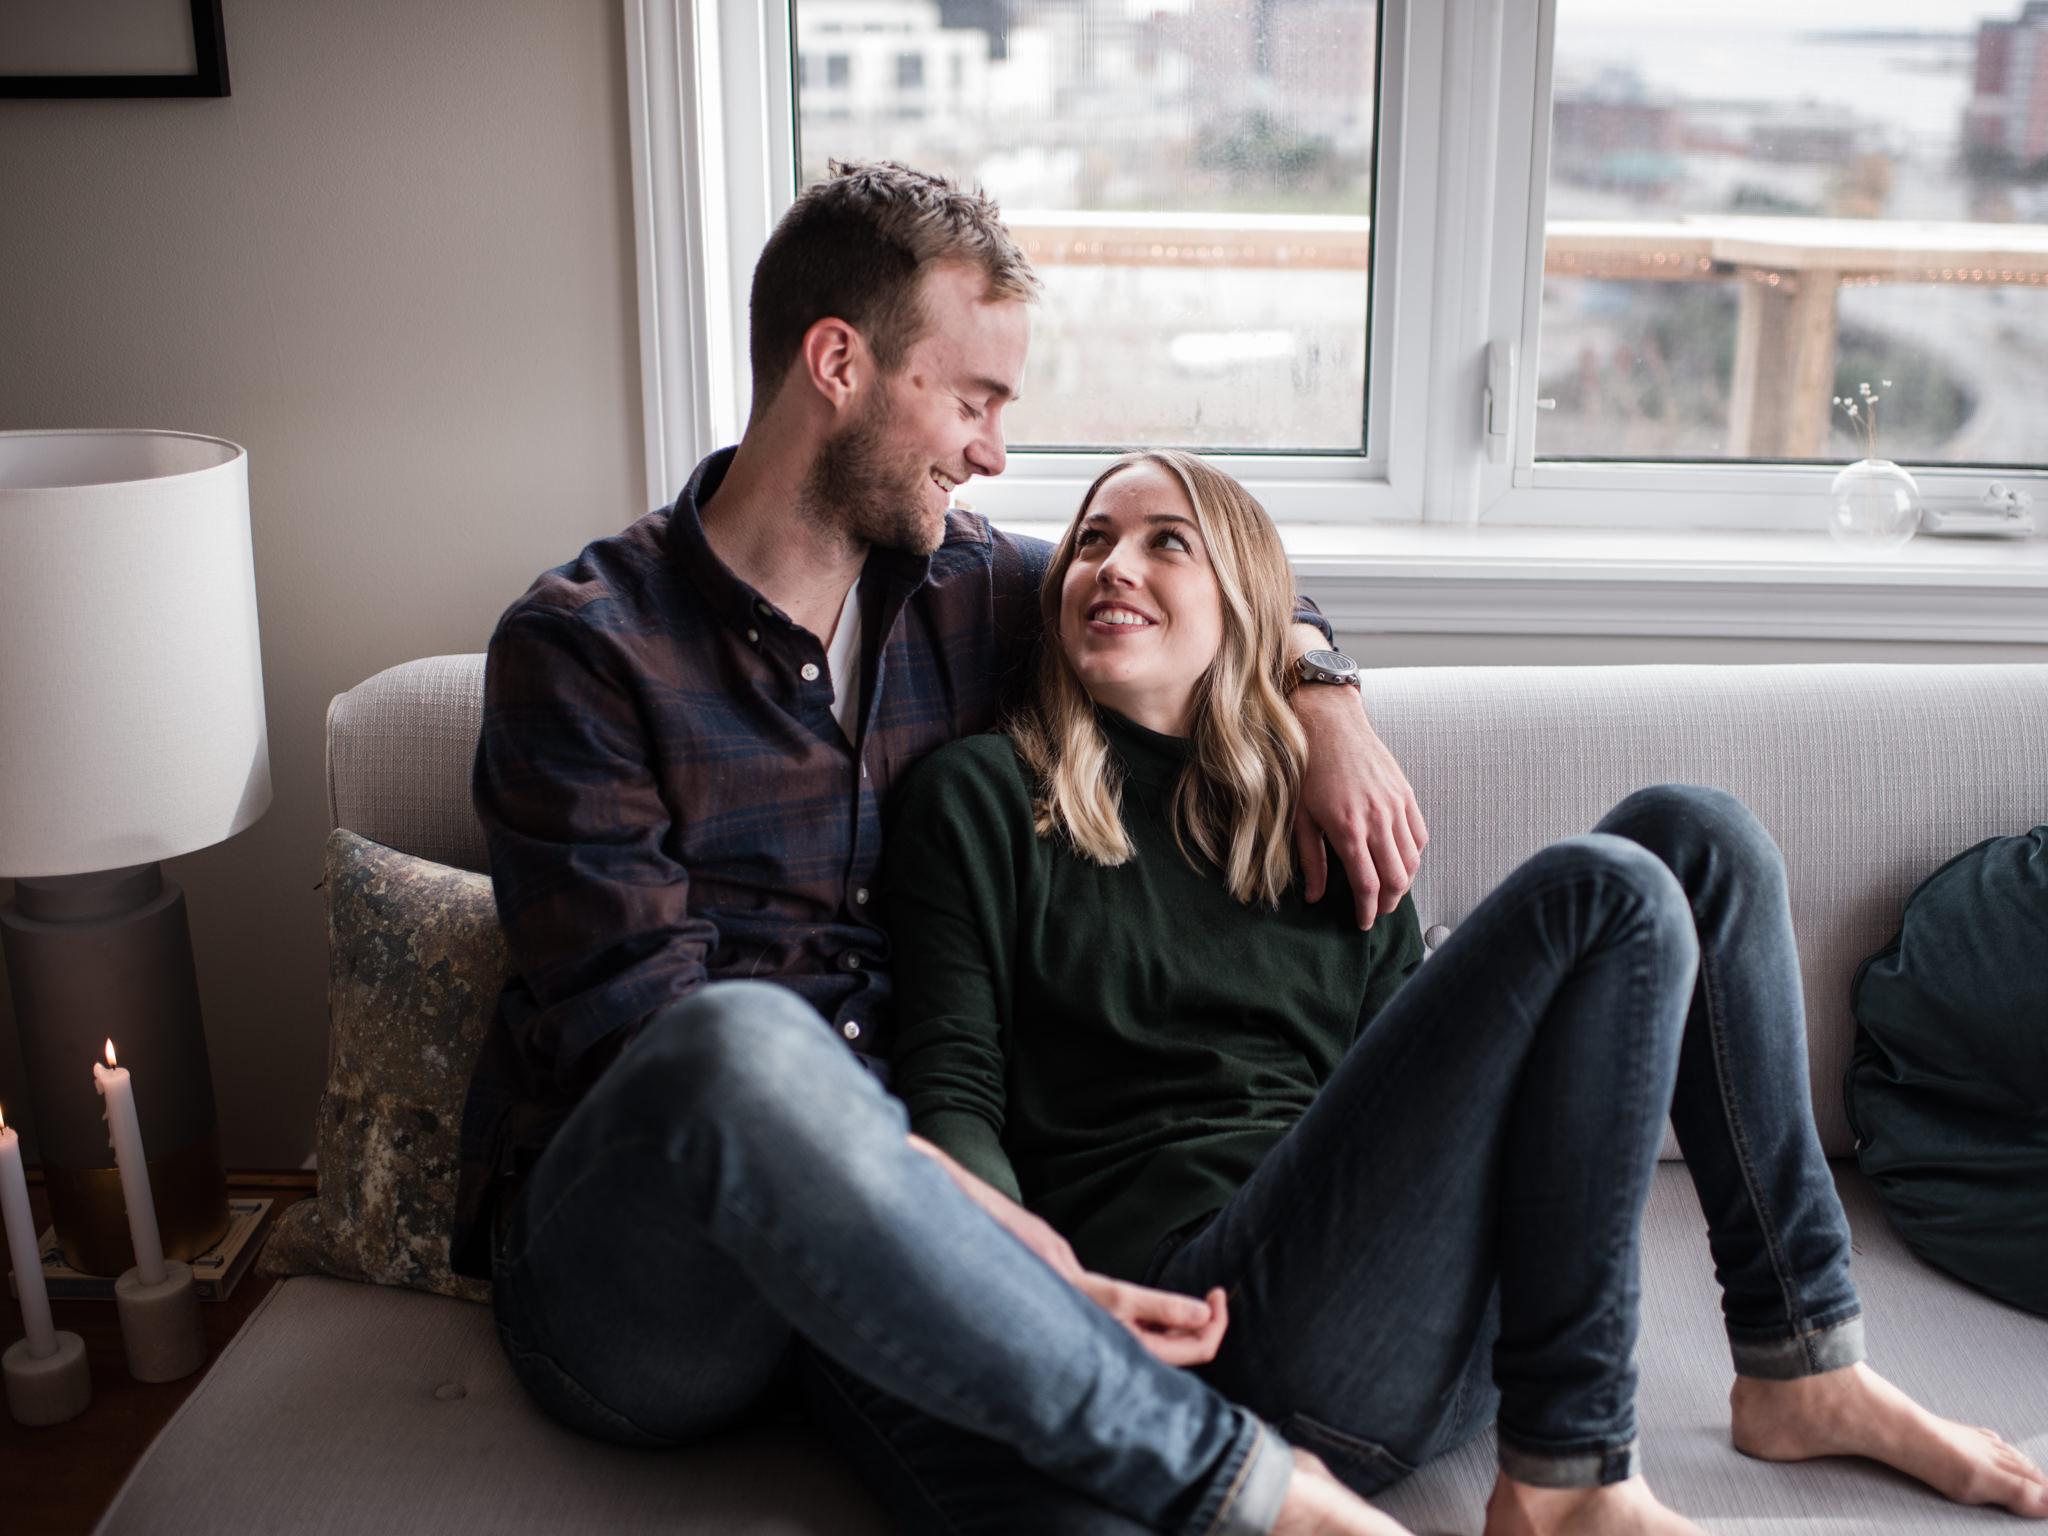 intimate-at-home-engagement-toronto-saint-john-24.jpg